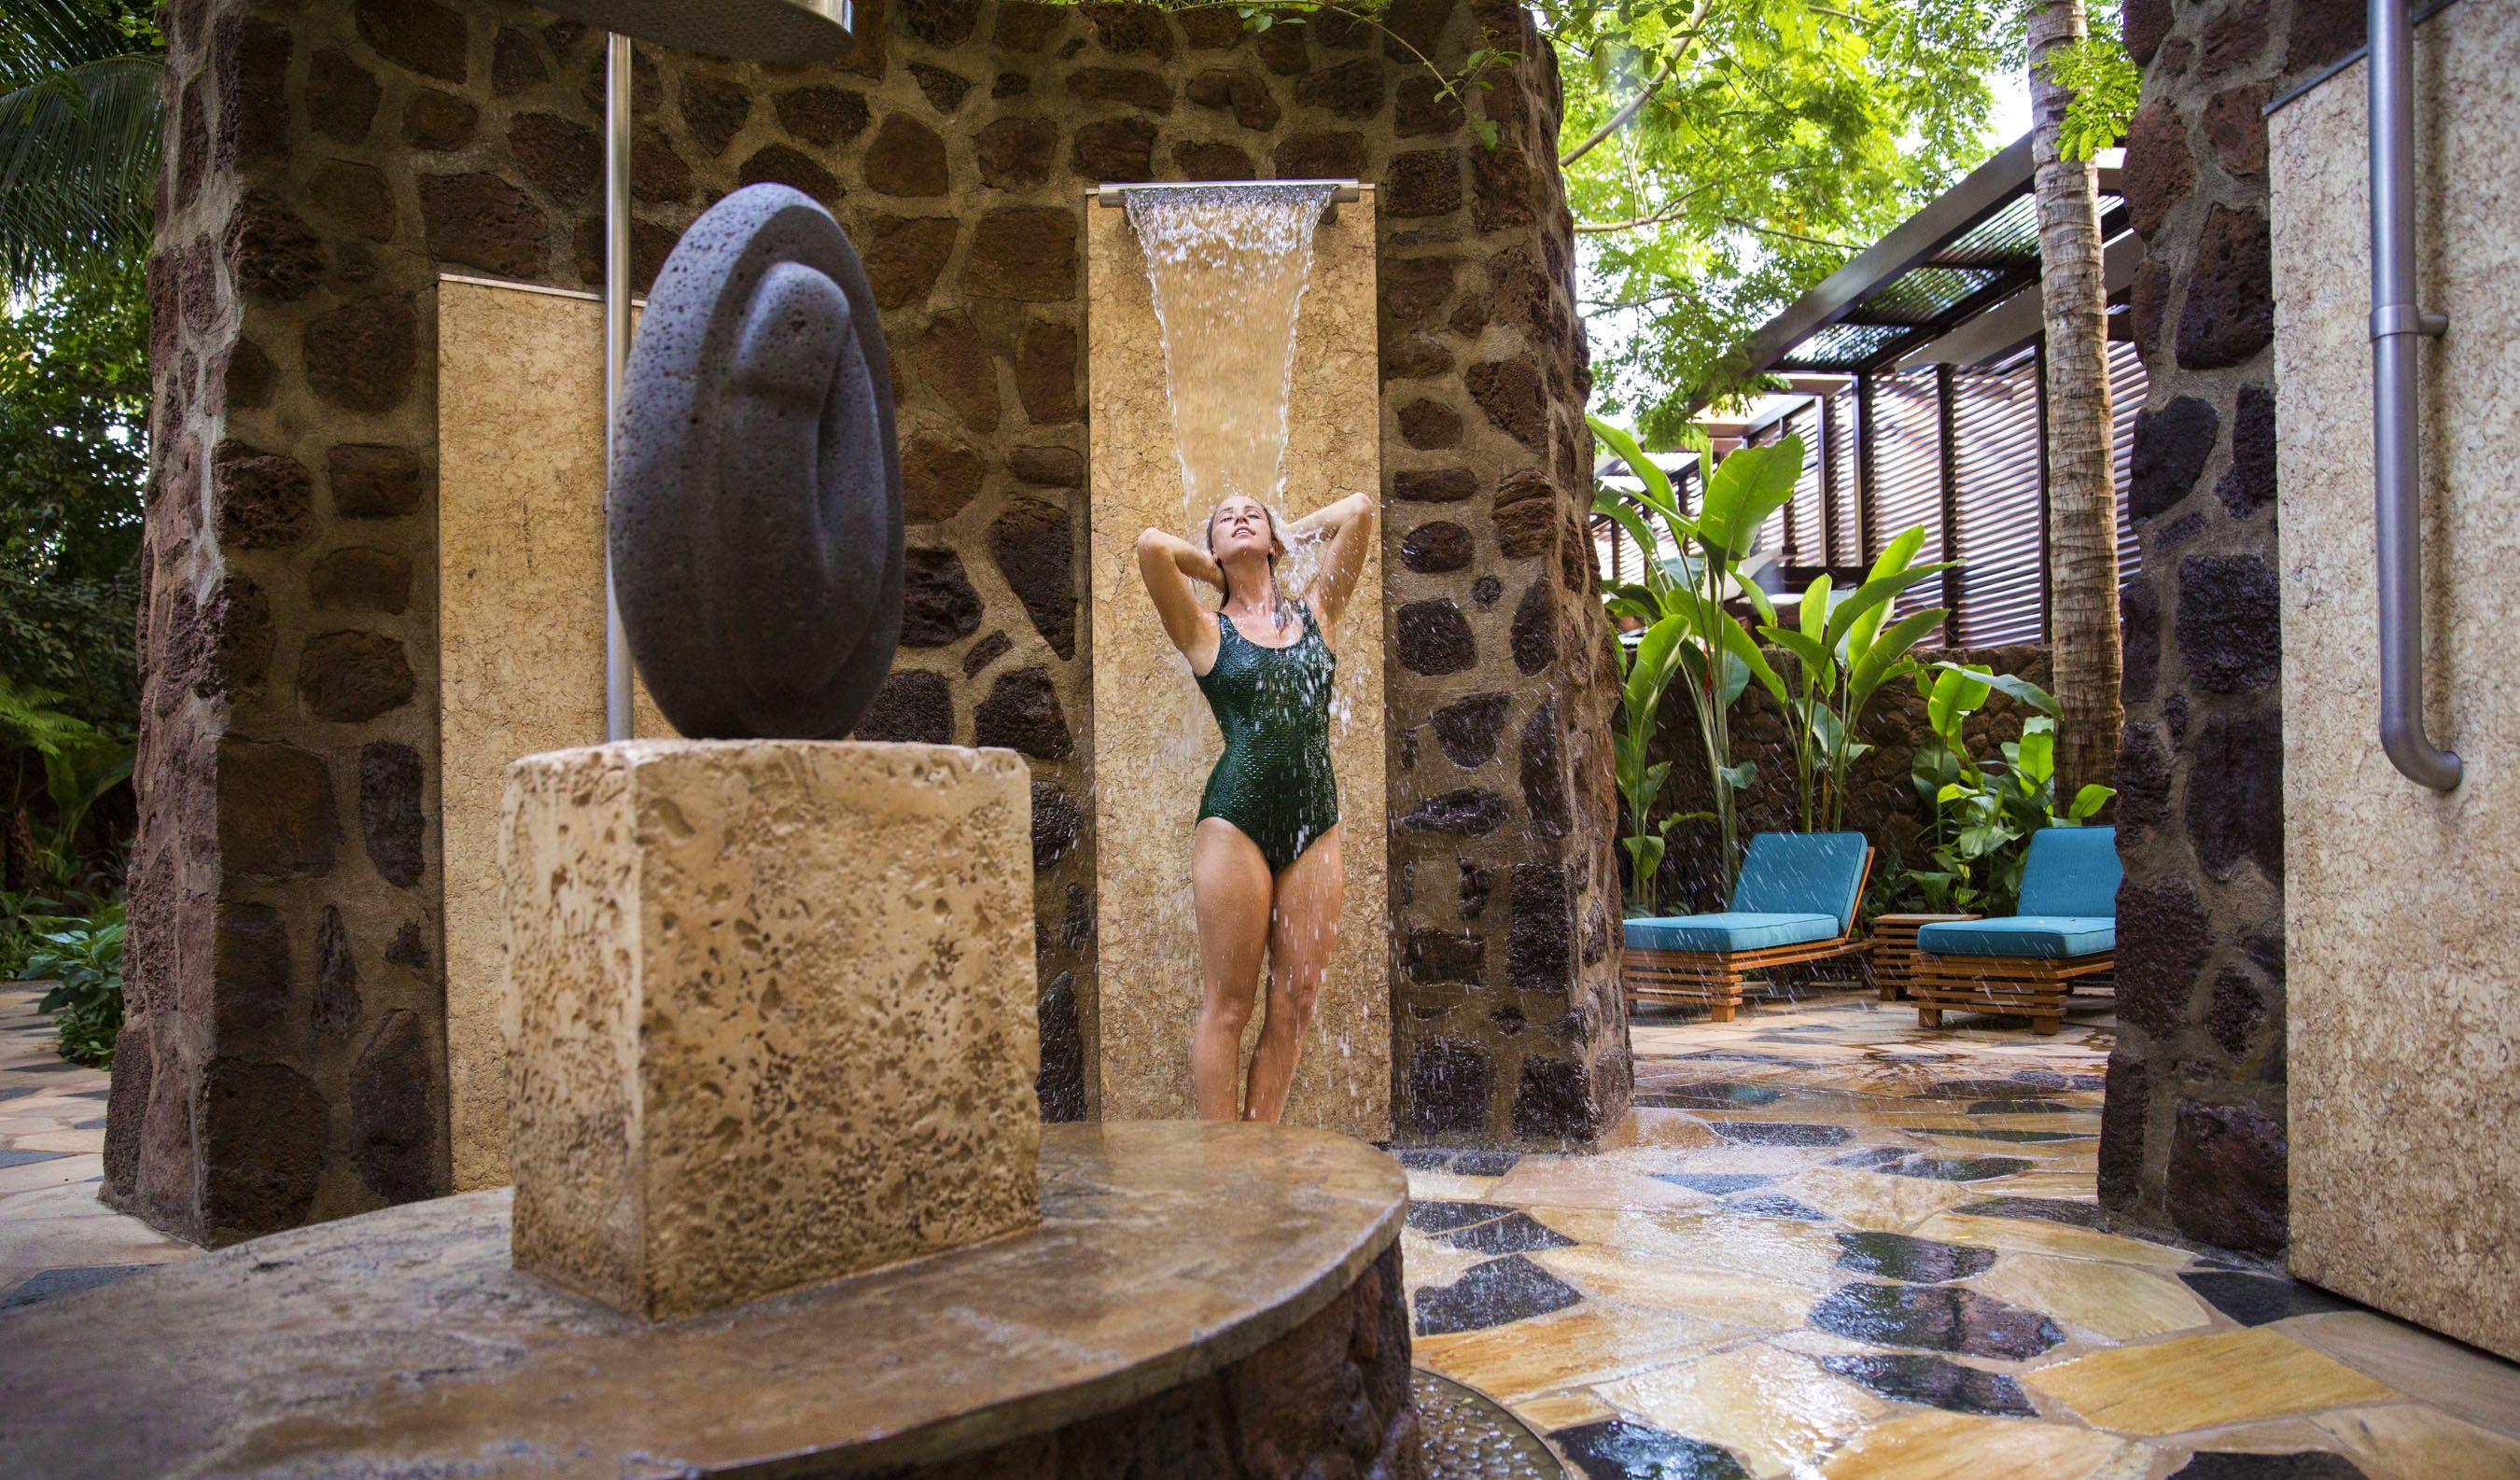 14 Top Reasons to Visit Disney's Aulani in Hawaii